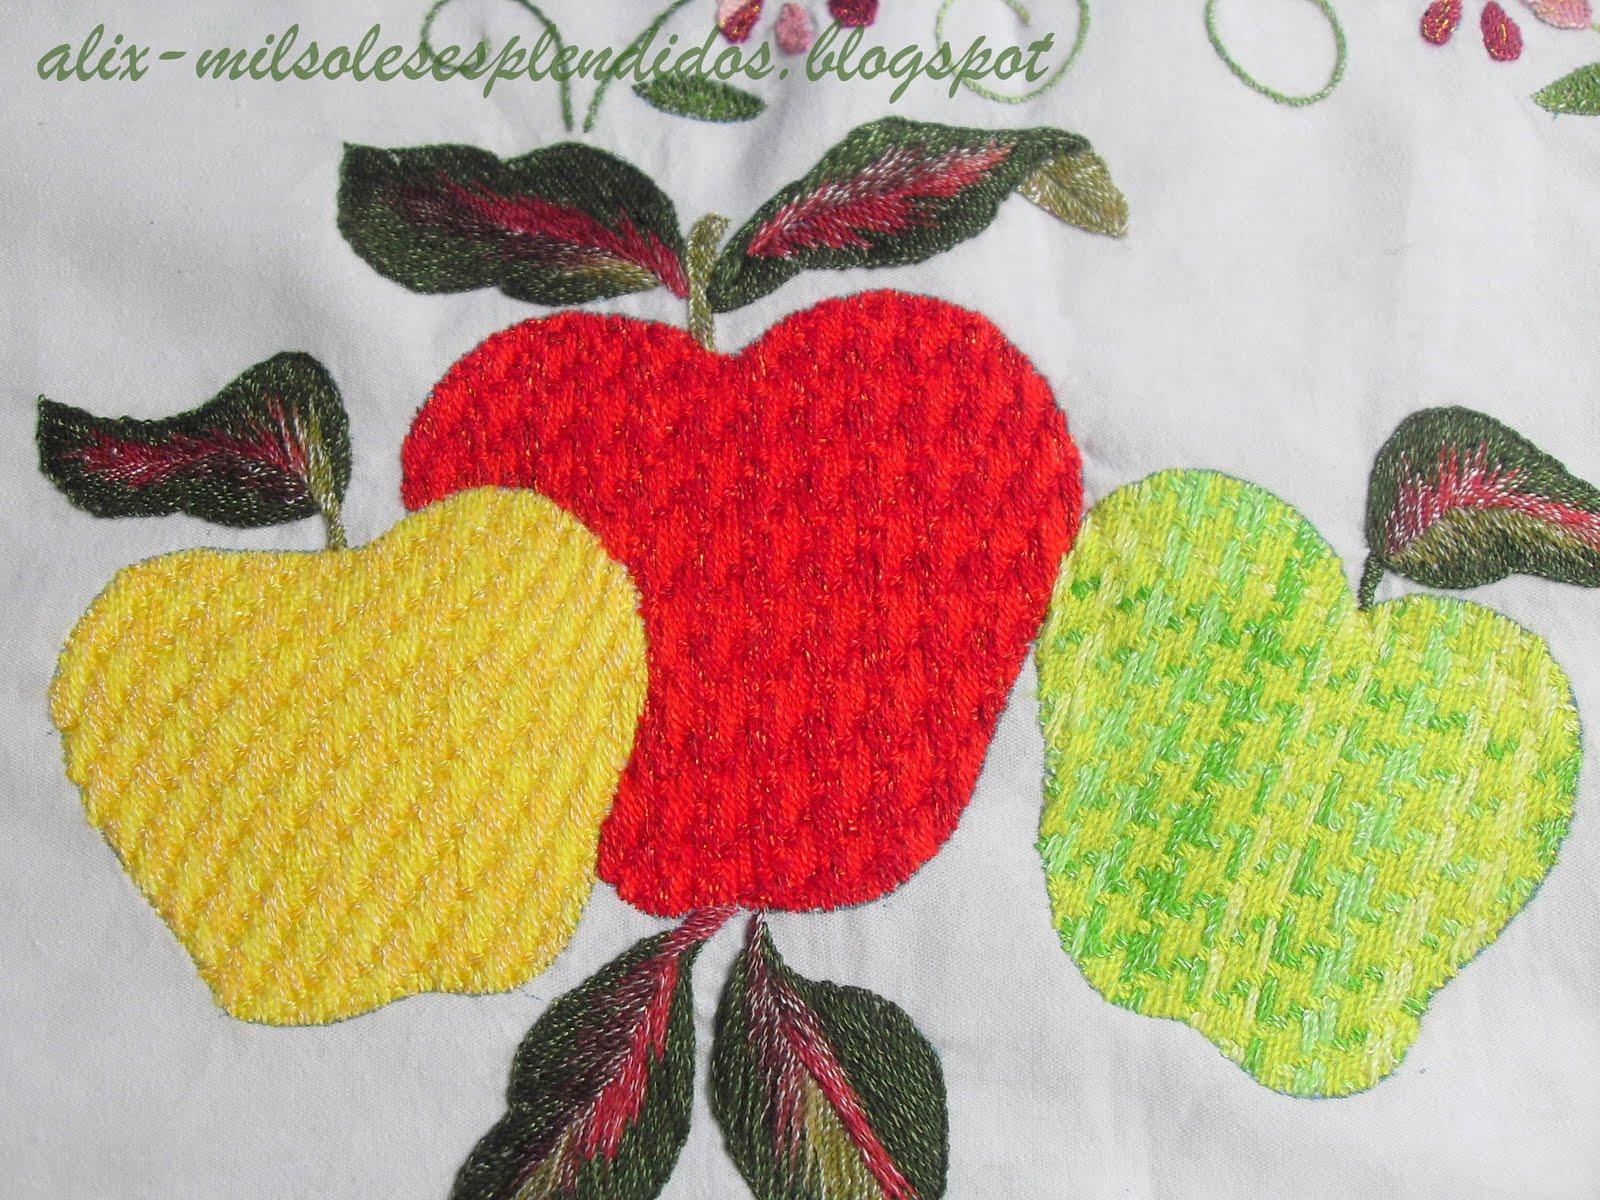 la puntada de las manzanas rehilete de las hojas matiz